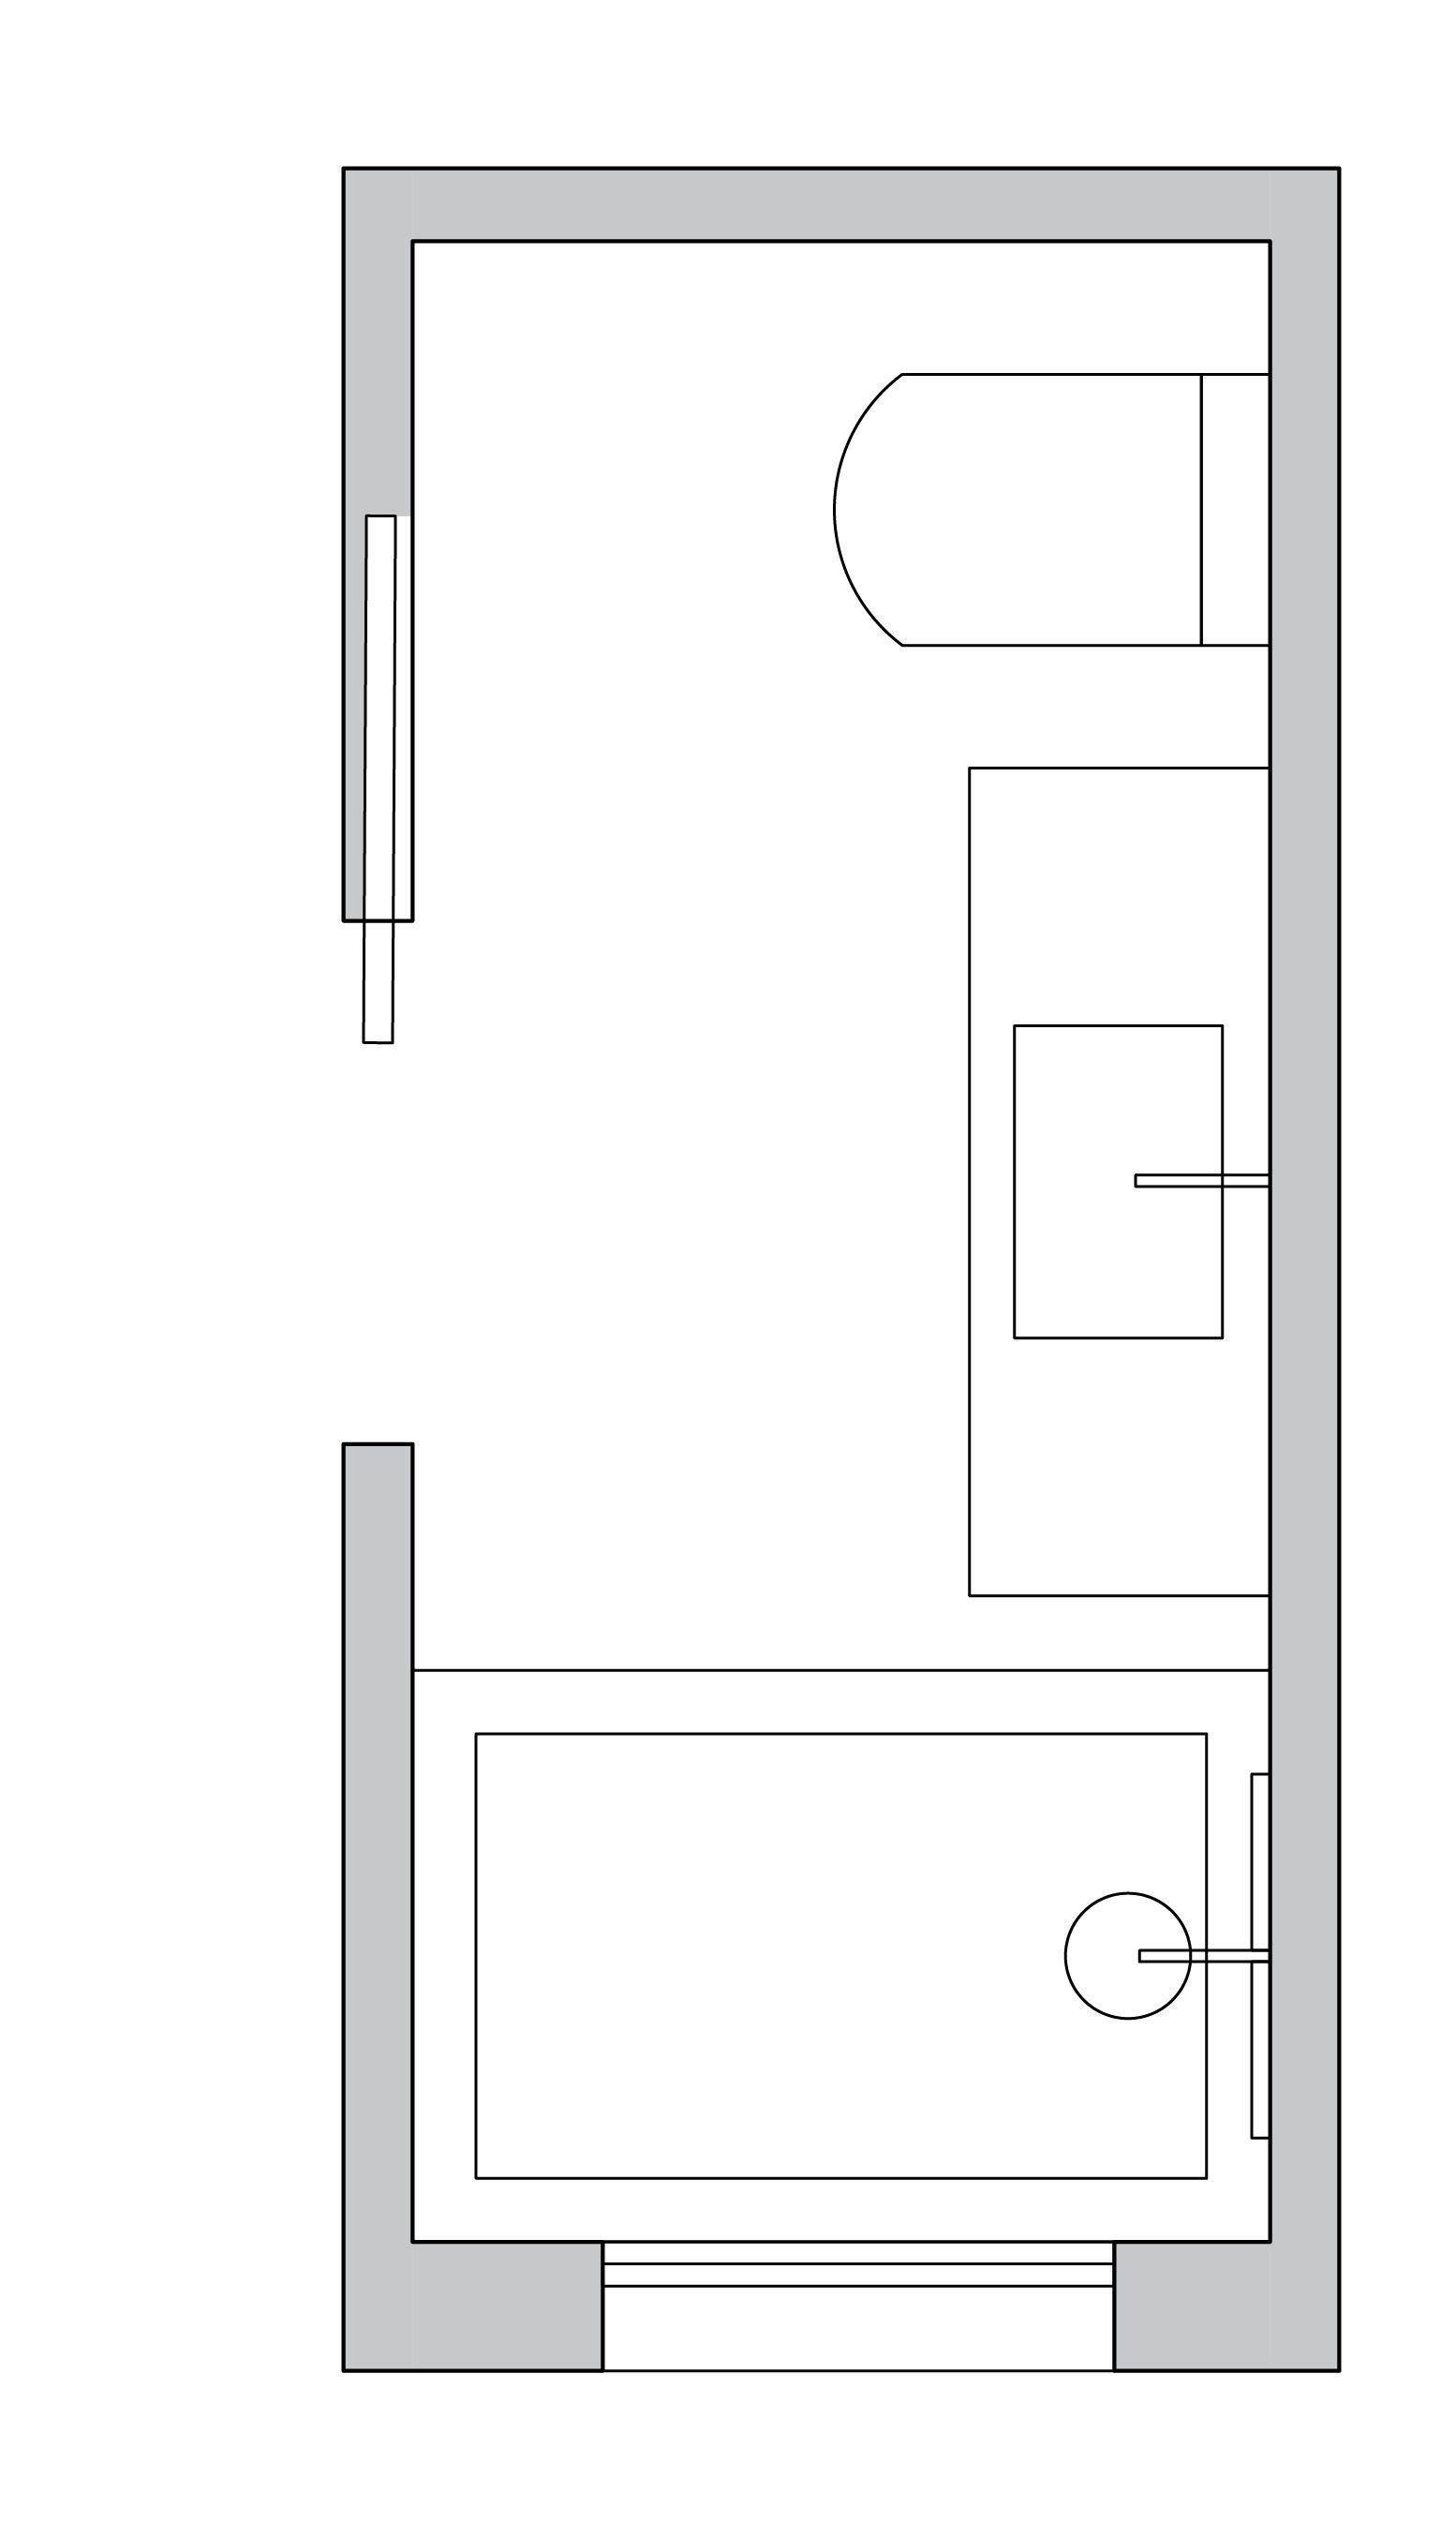 Long and narrow Bathroom Layout | Home renovation | Pinterest ...